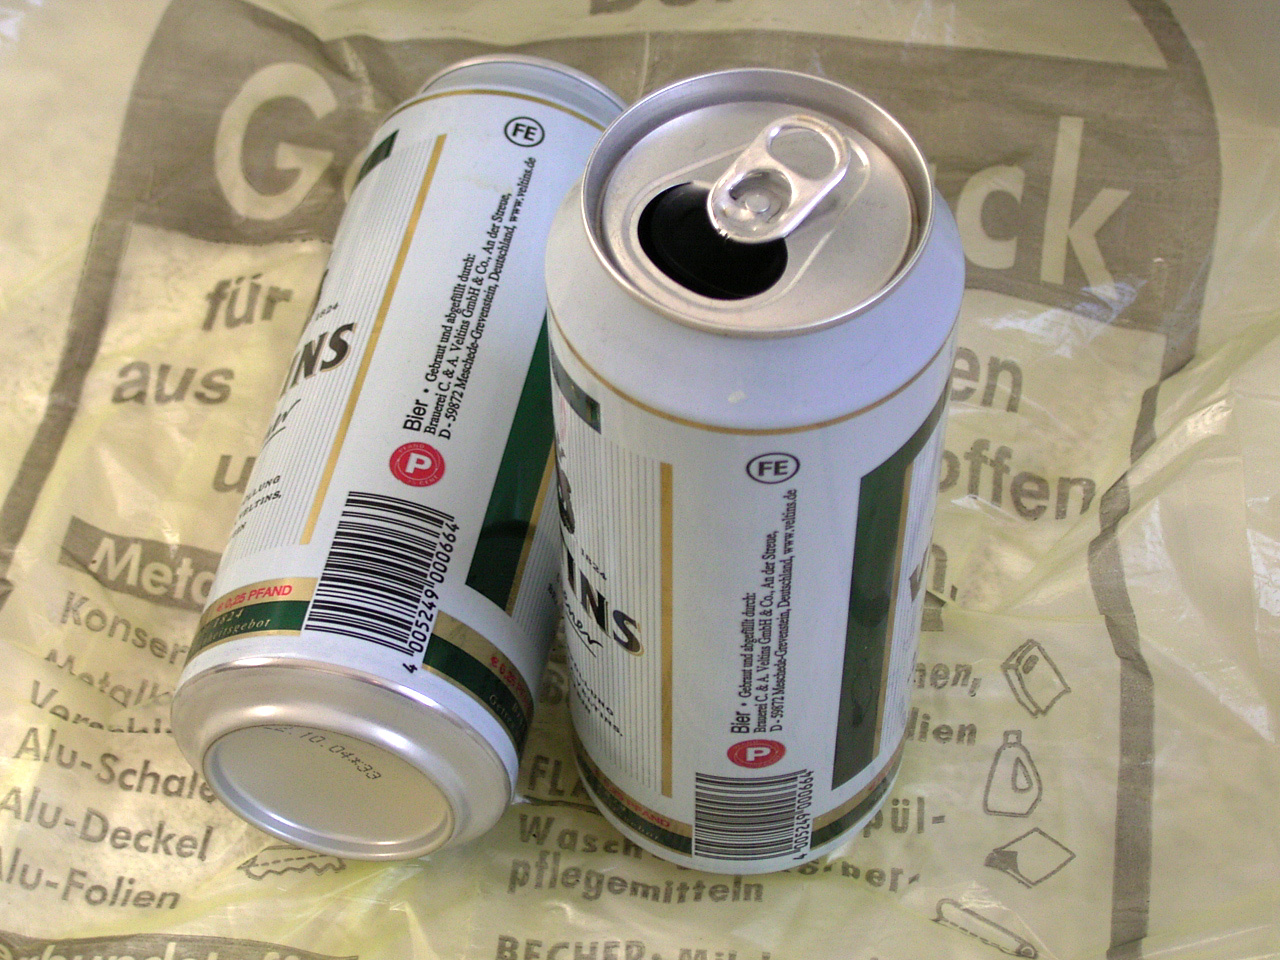 Red Bull Kuehlschrank Dose : Getränkedose u wikipedia